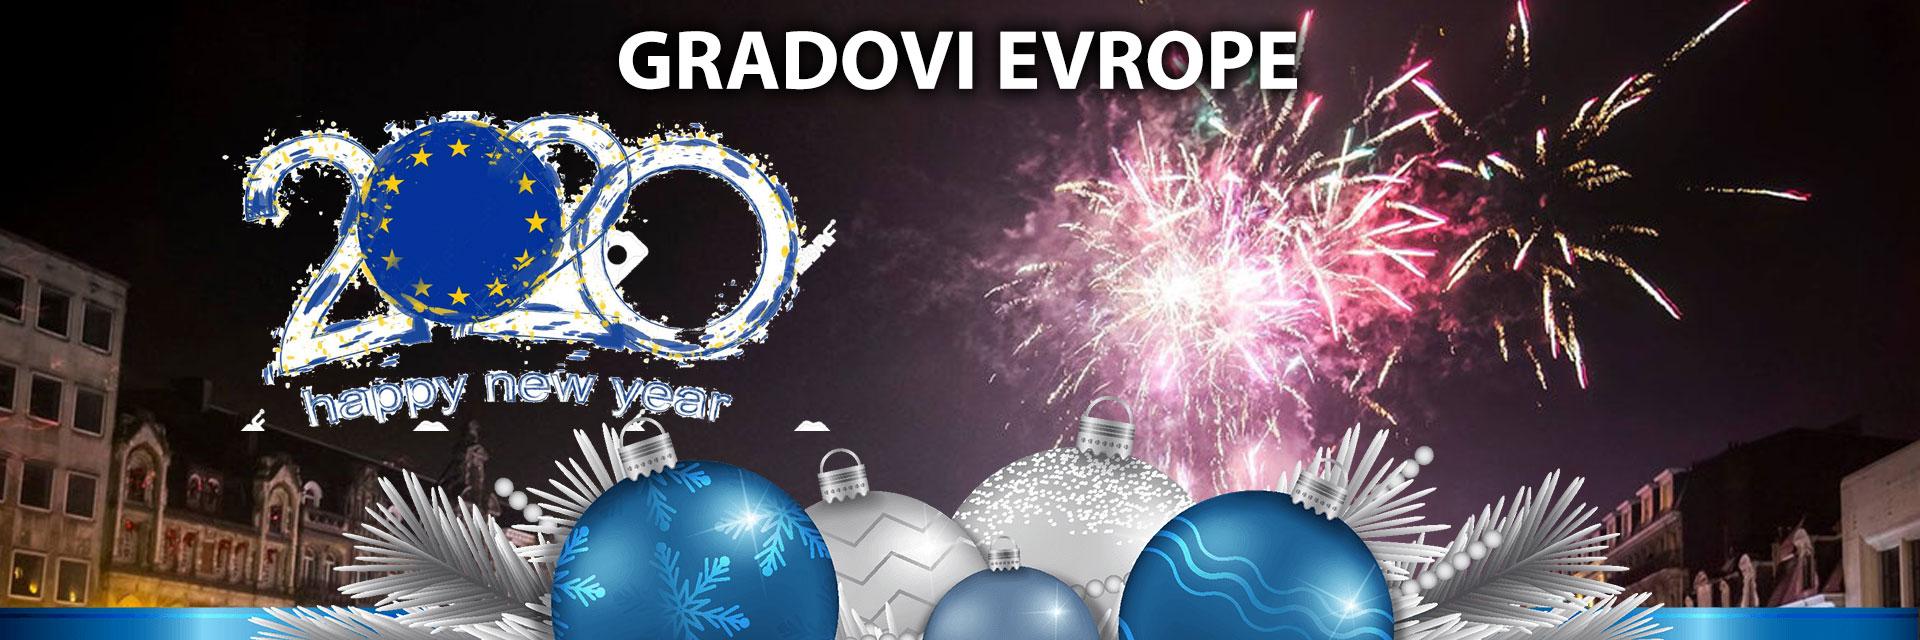 gradovievropanovagodina2020